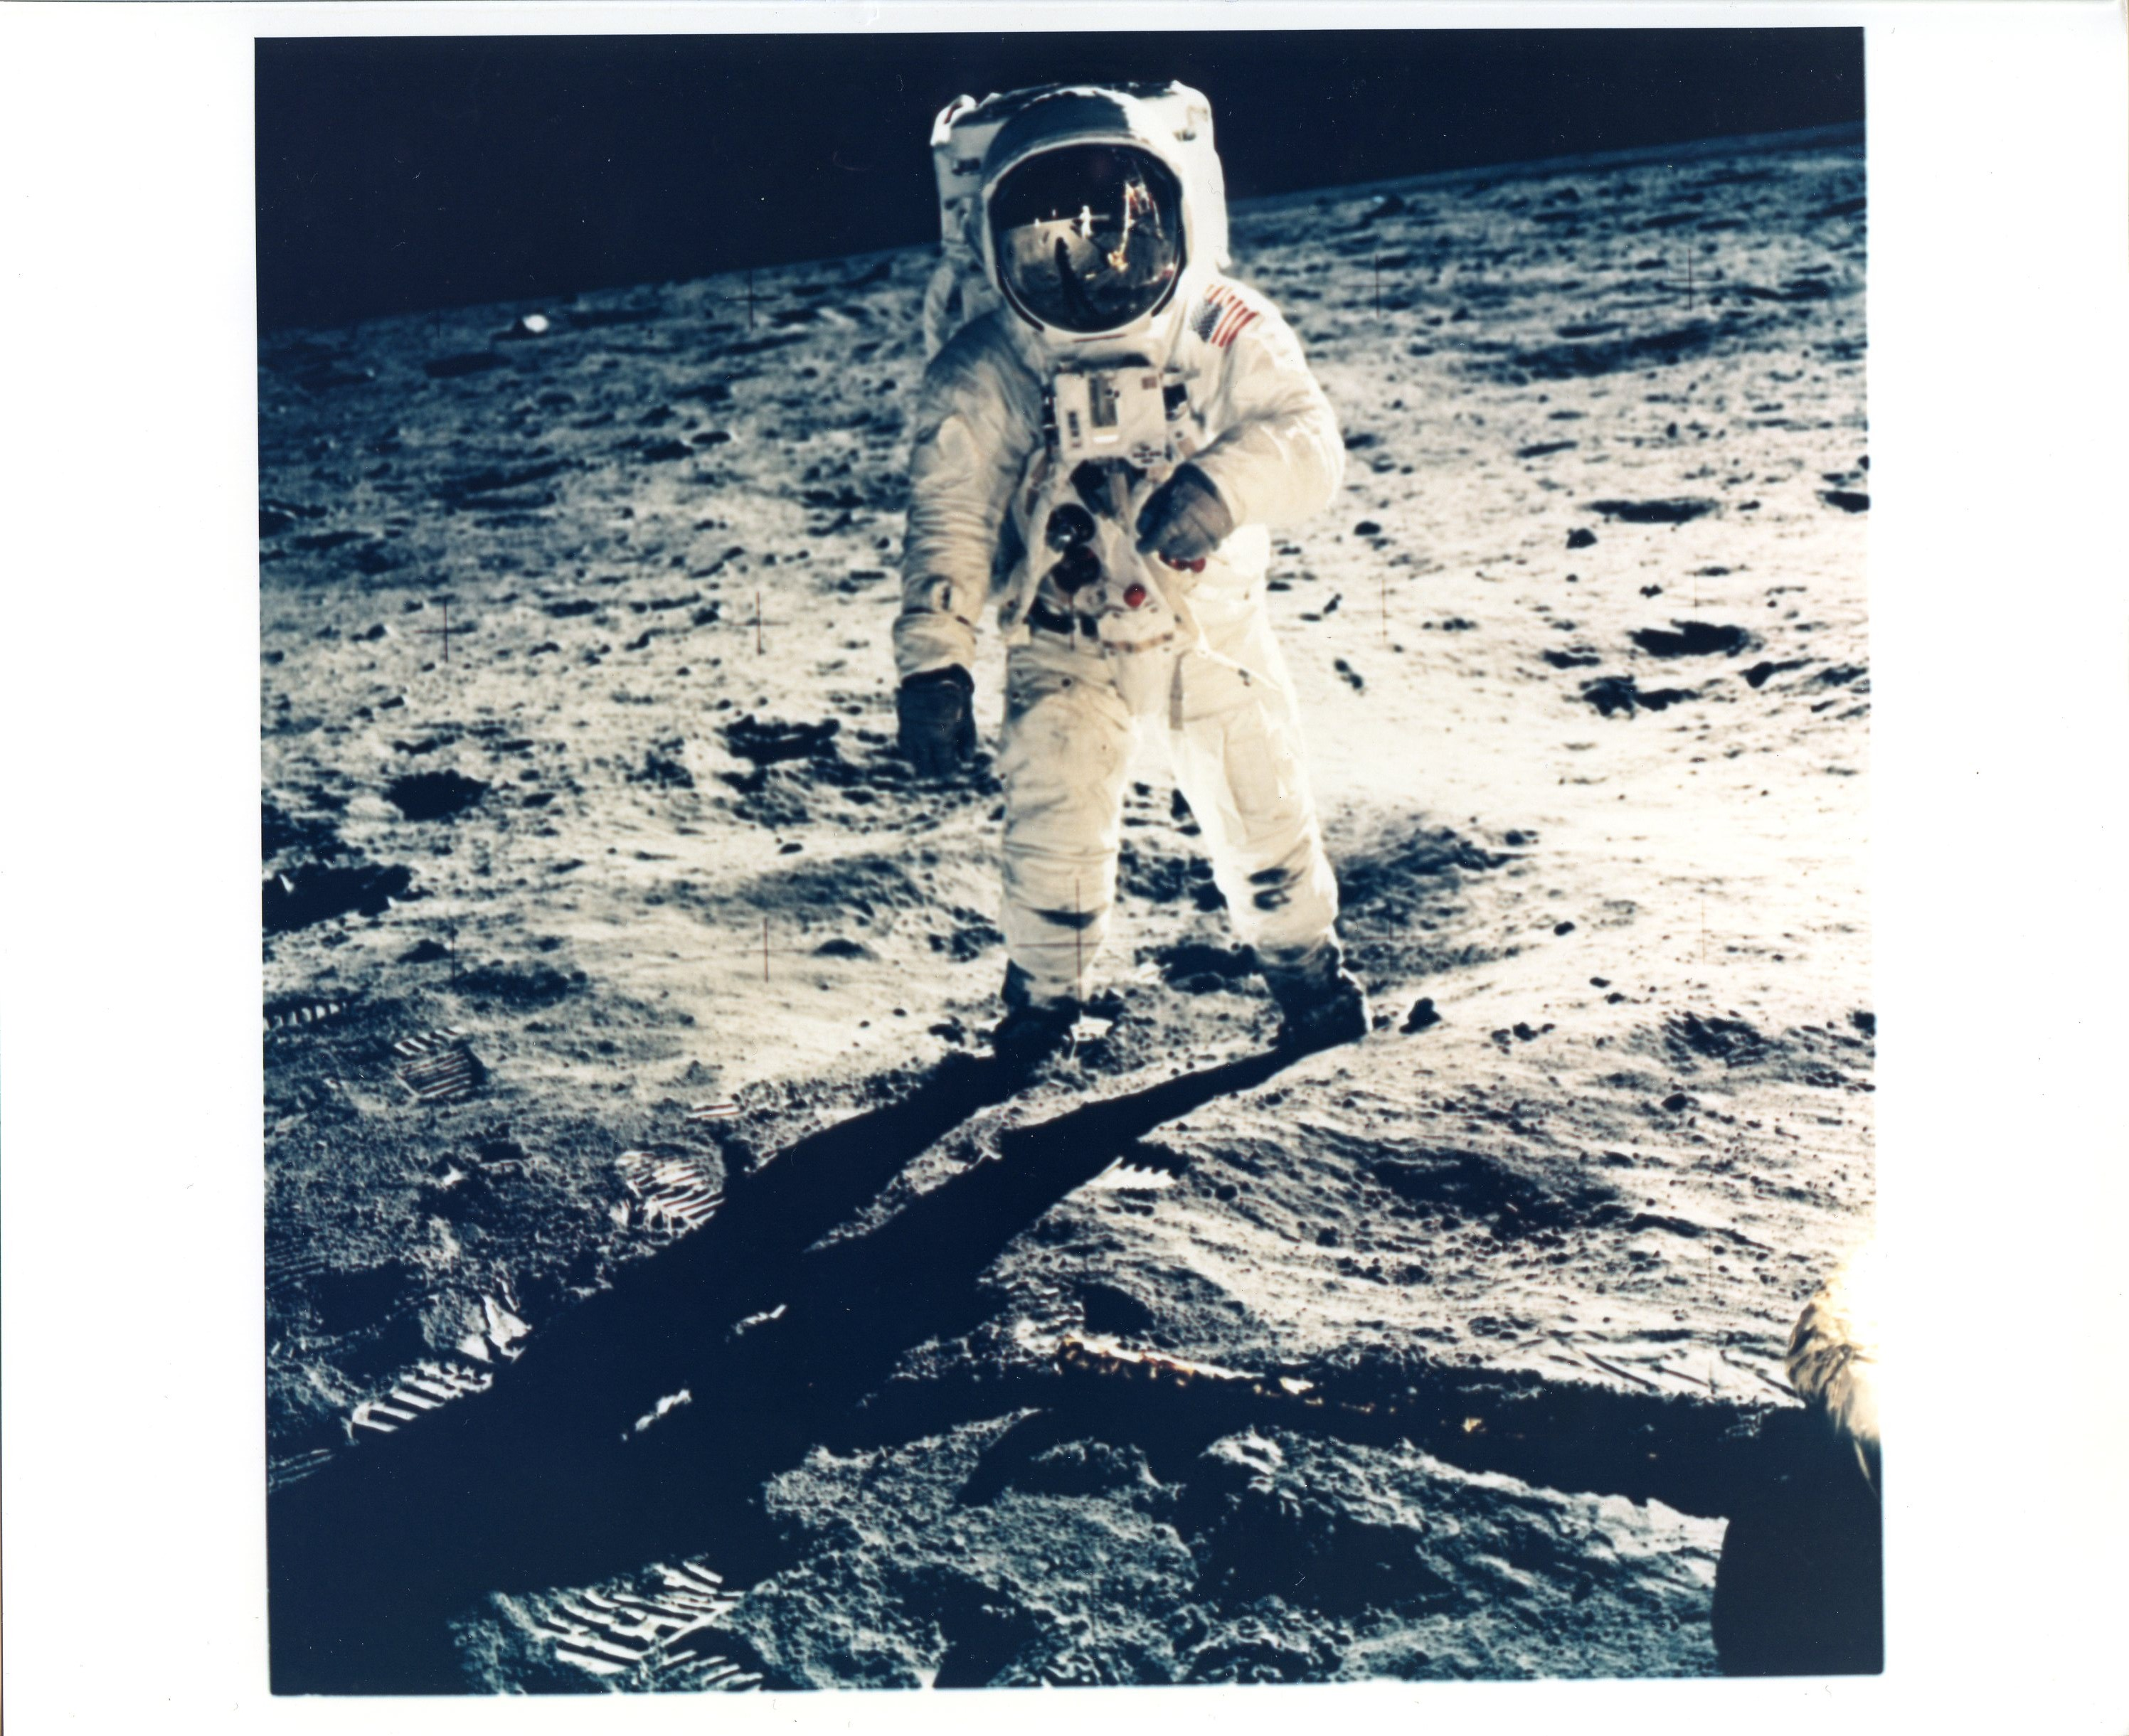 Exposition de photographies de la NASA